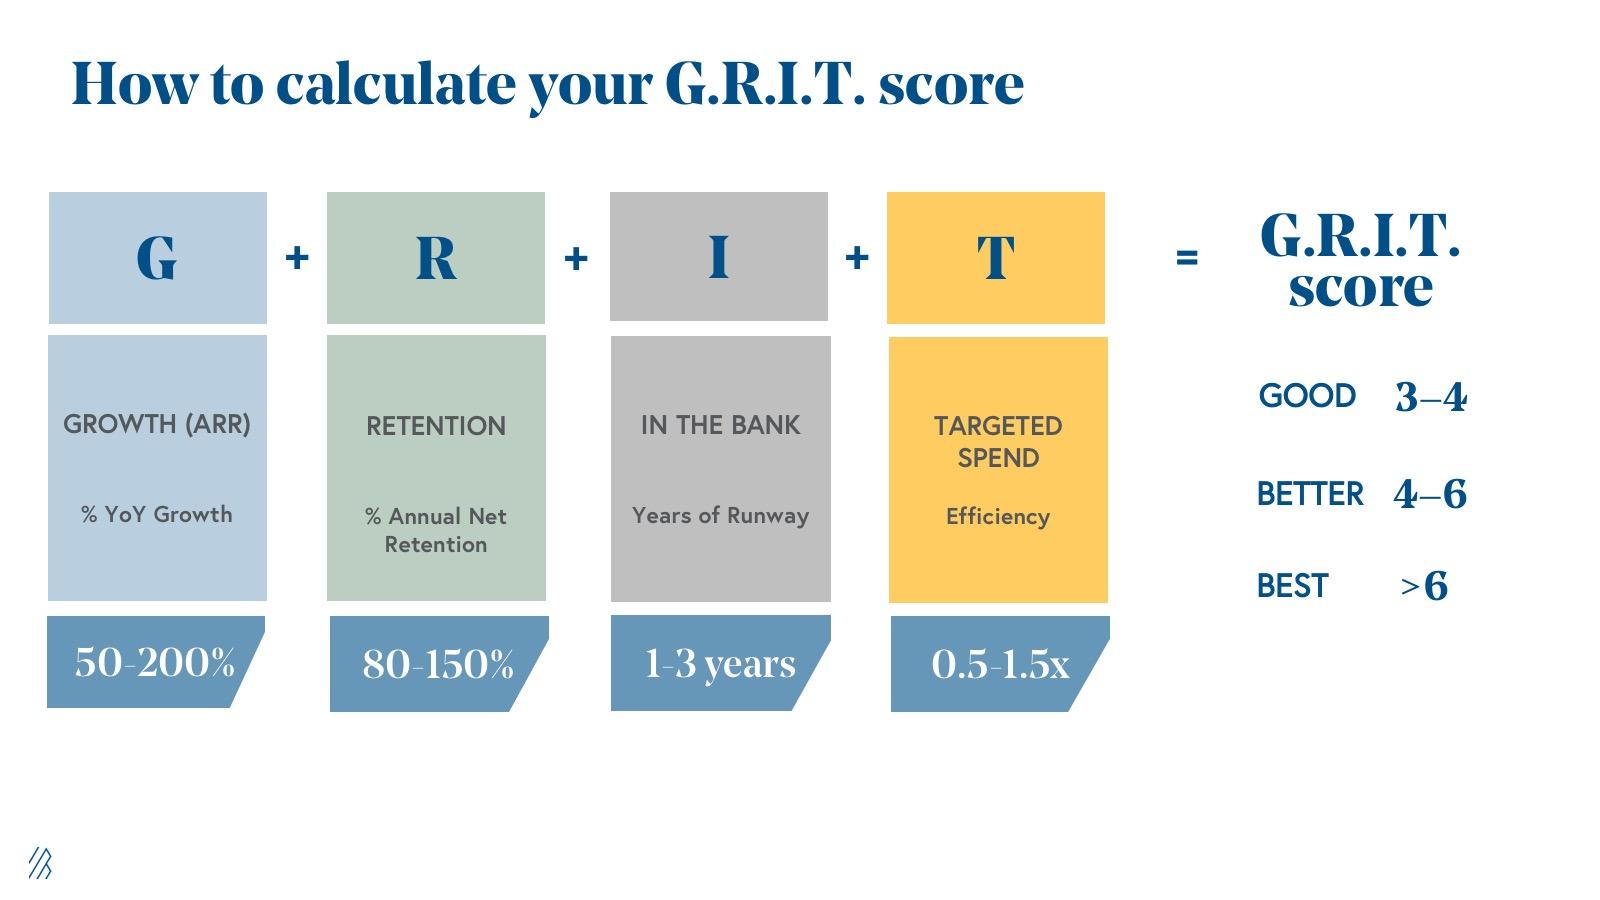 G.R.I.T. framework and equation